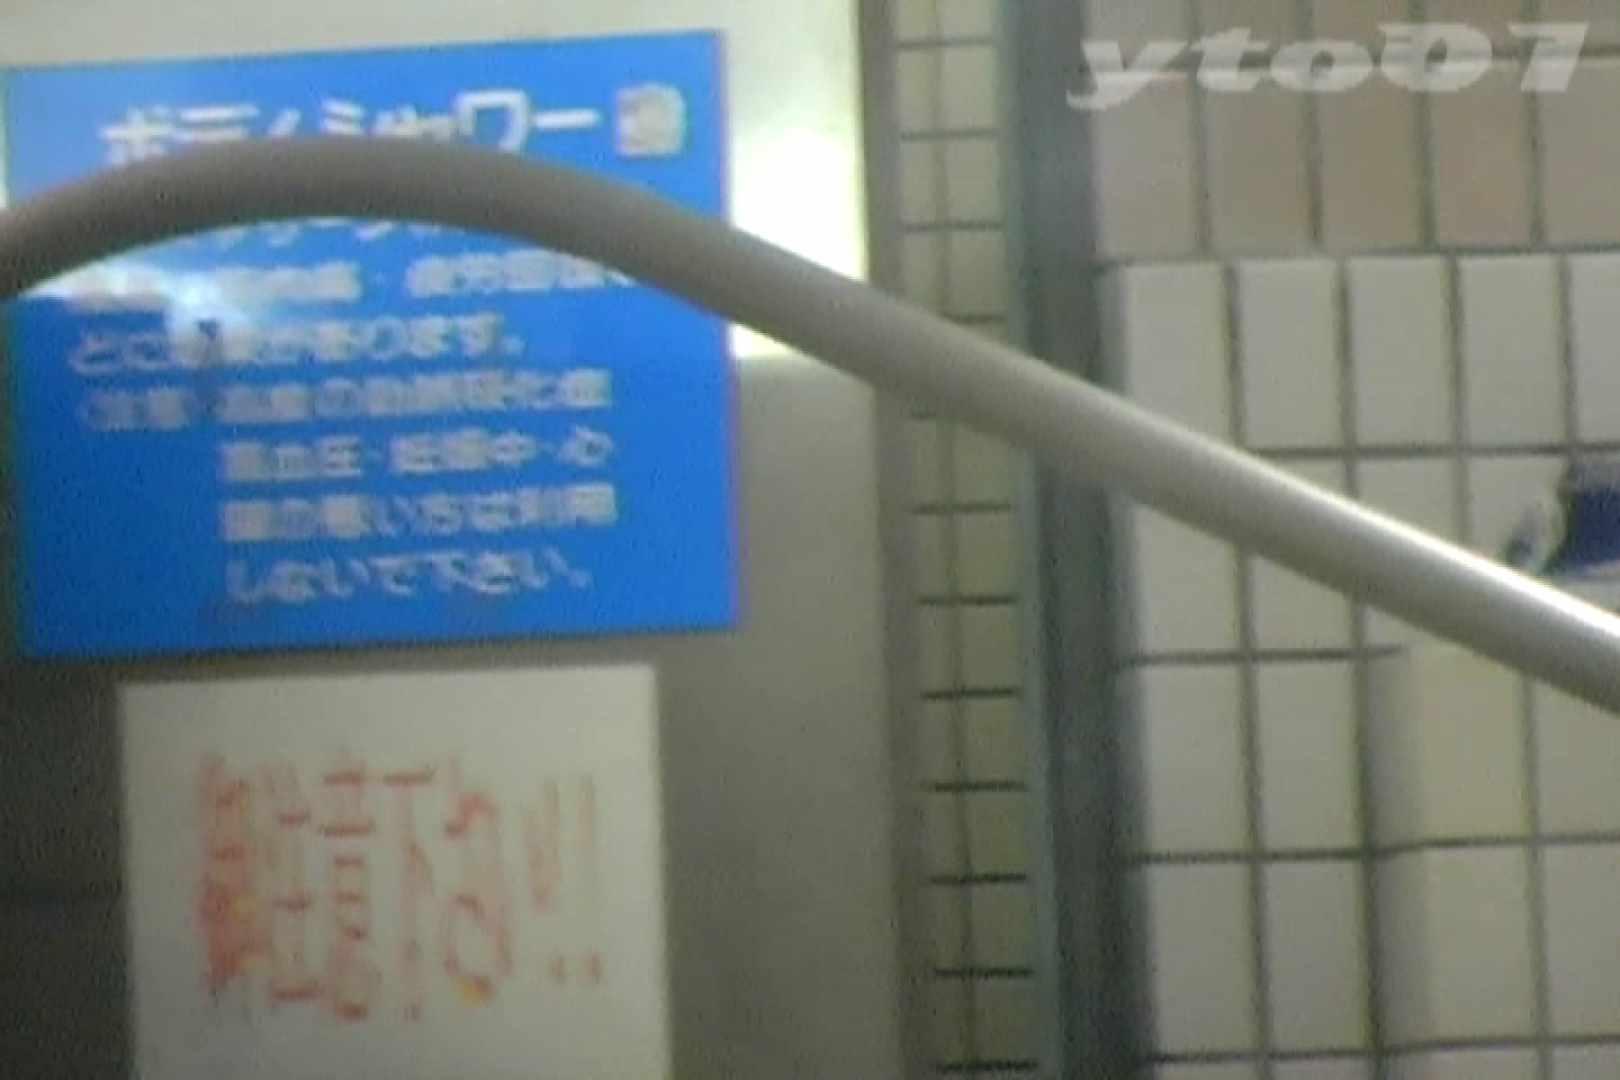 ▲復活限定▲合宿ホテル女風呂盗撮 Vol.05 0  25連発 24